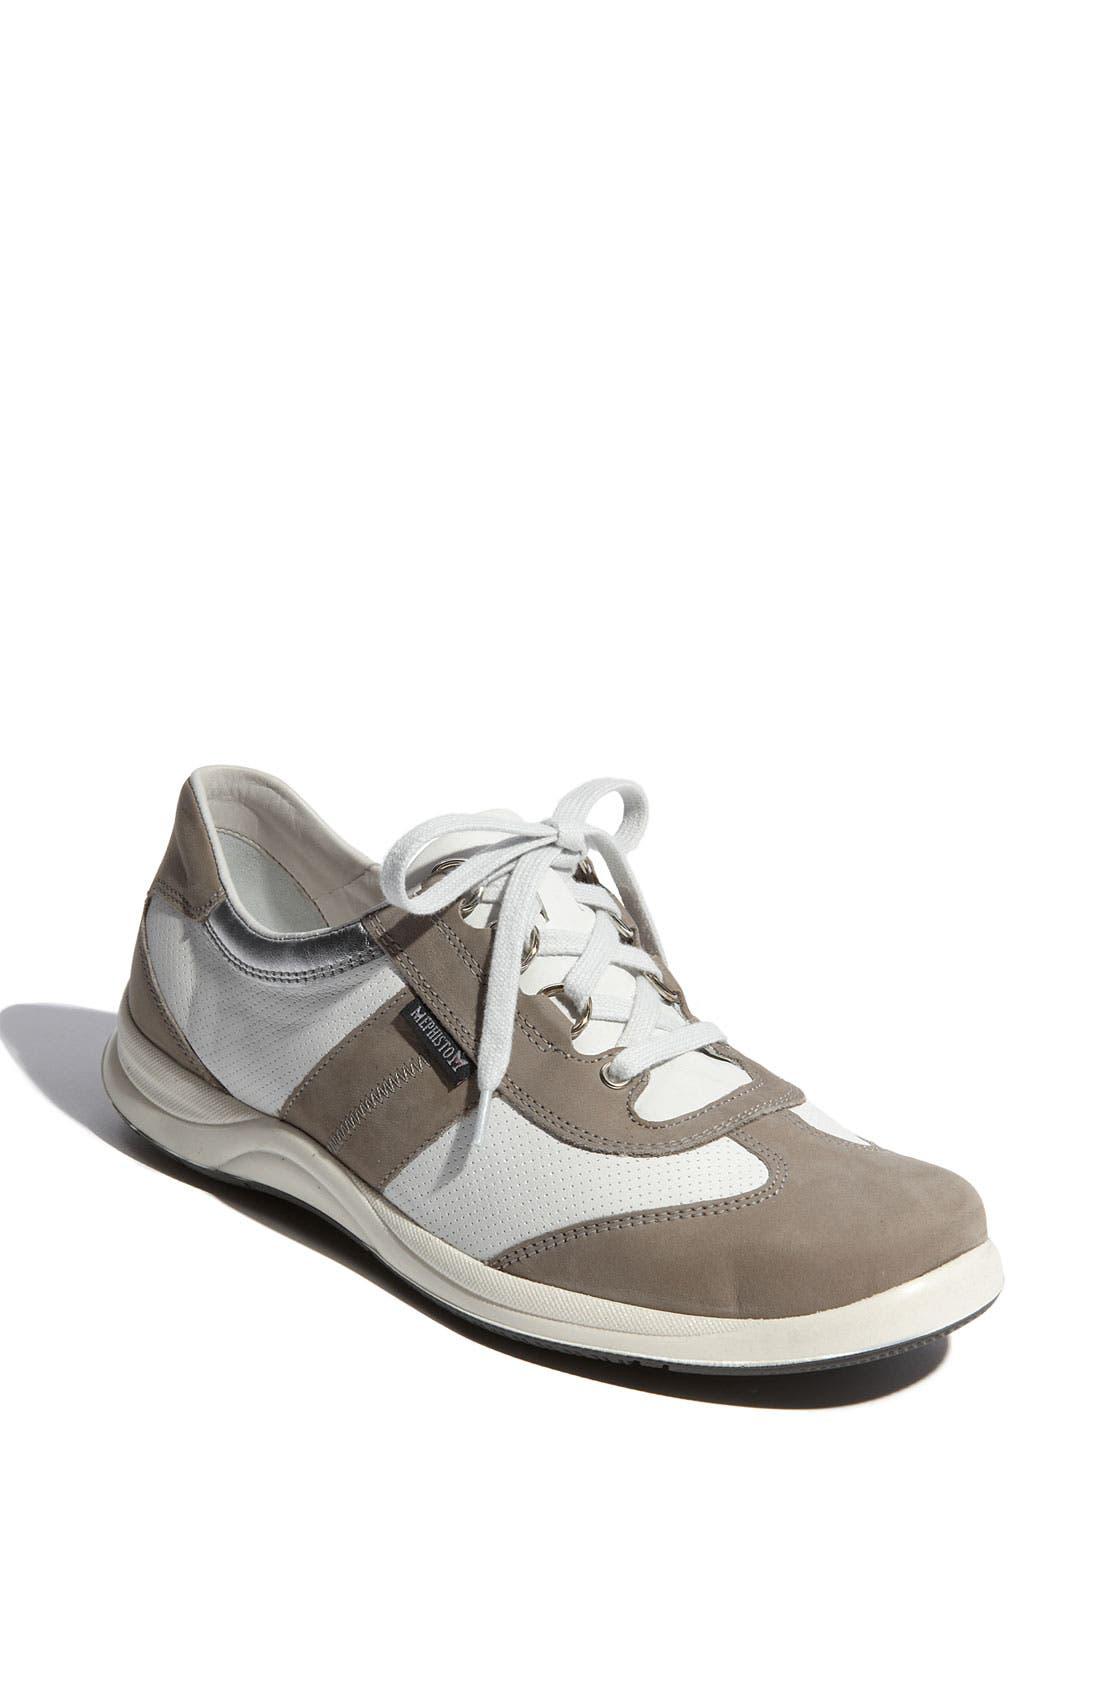 Main Image - Mephisto Laser Perforated Walking Shoe (Women)